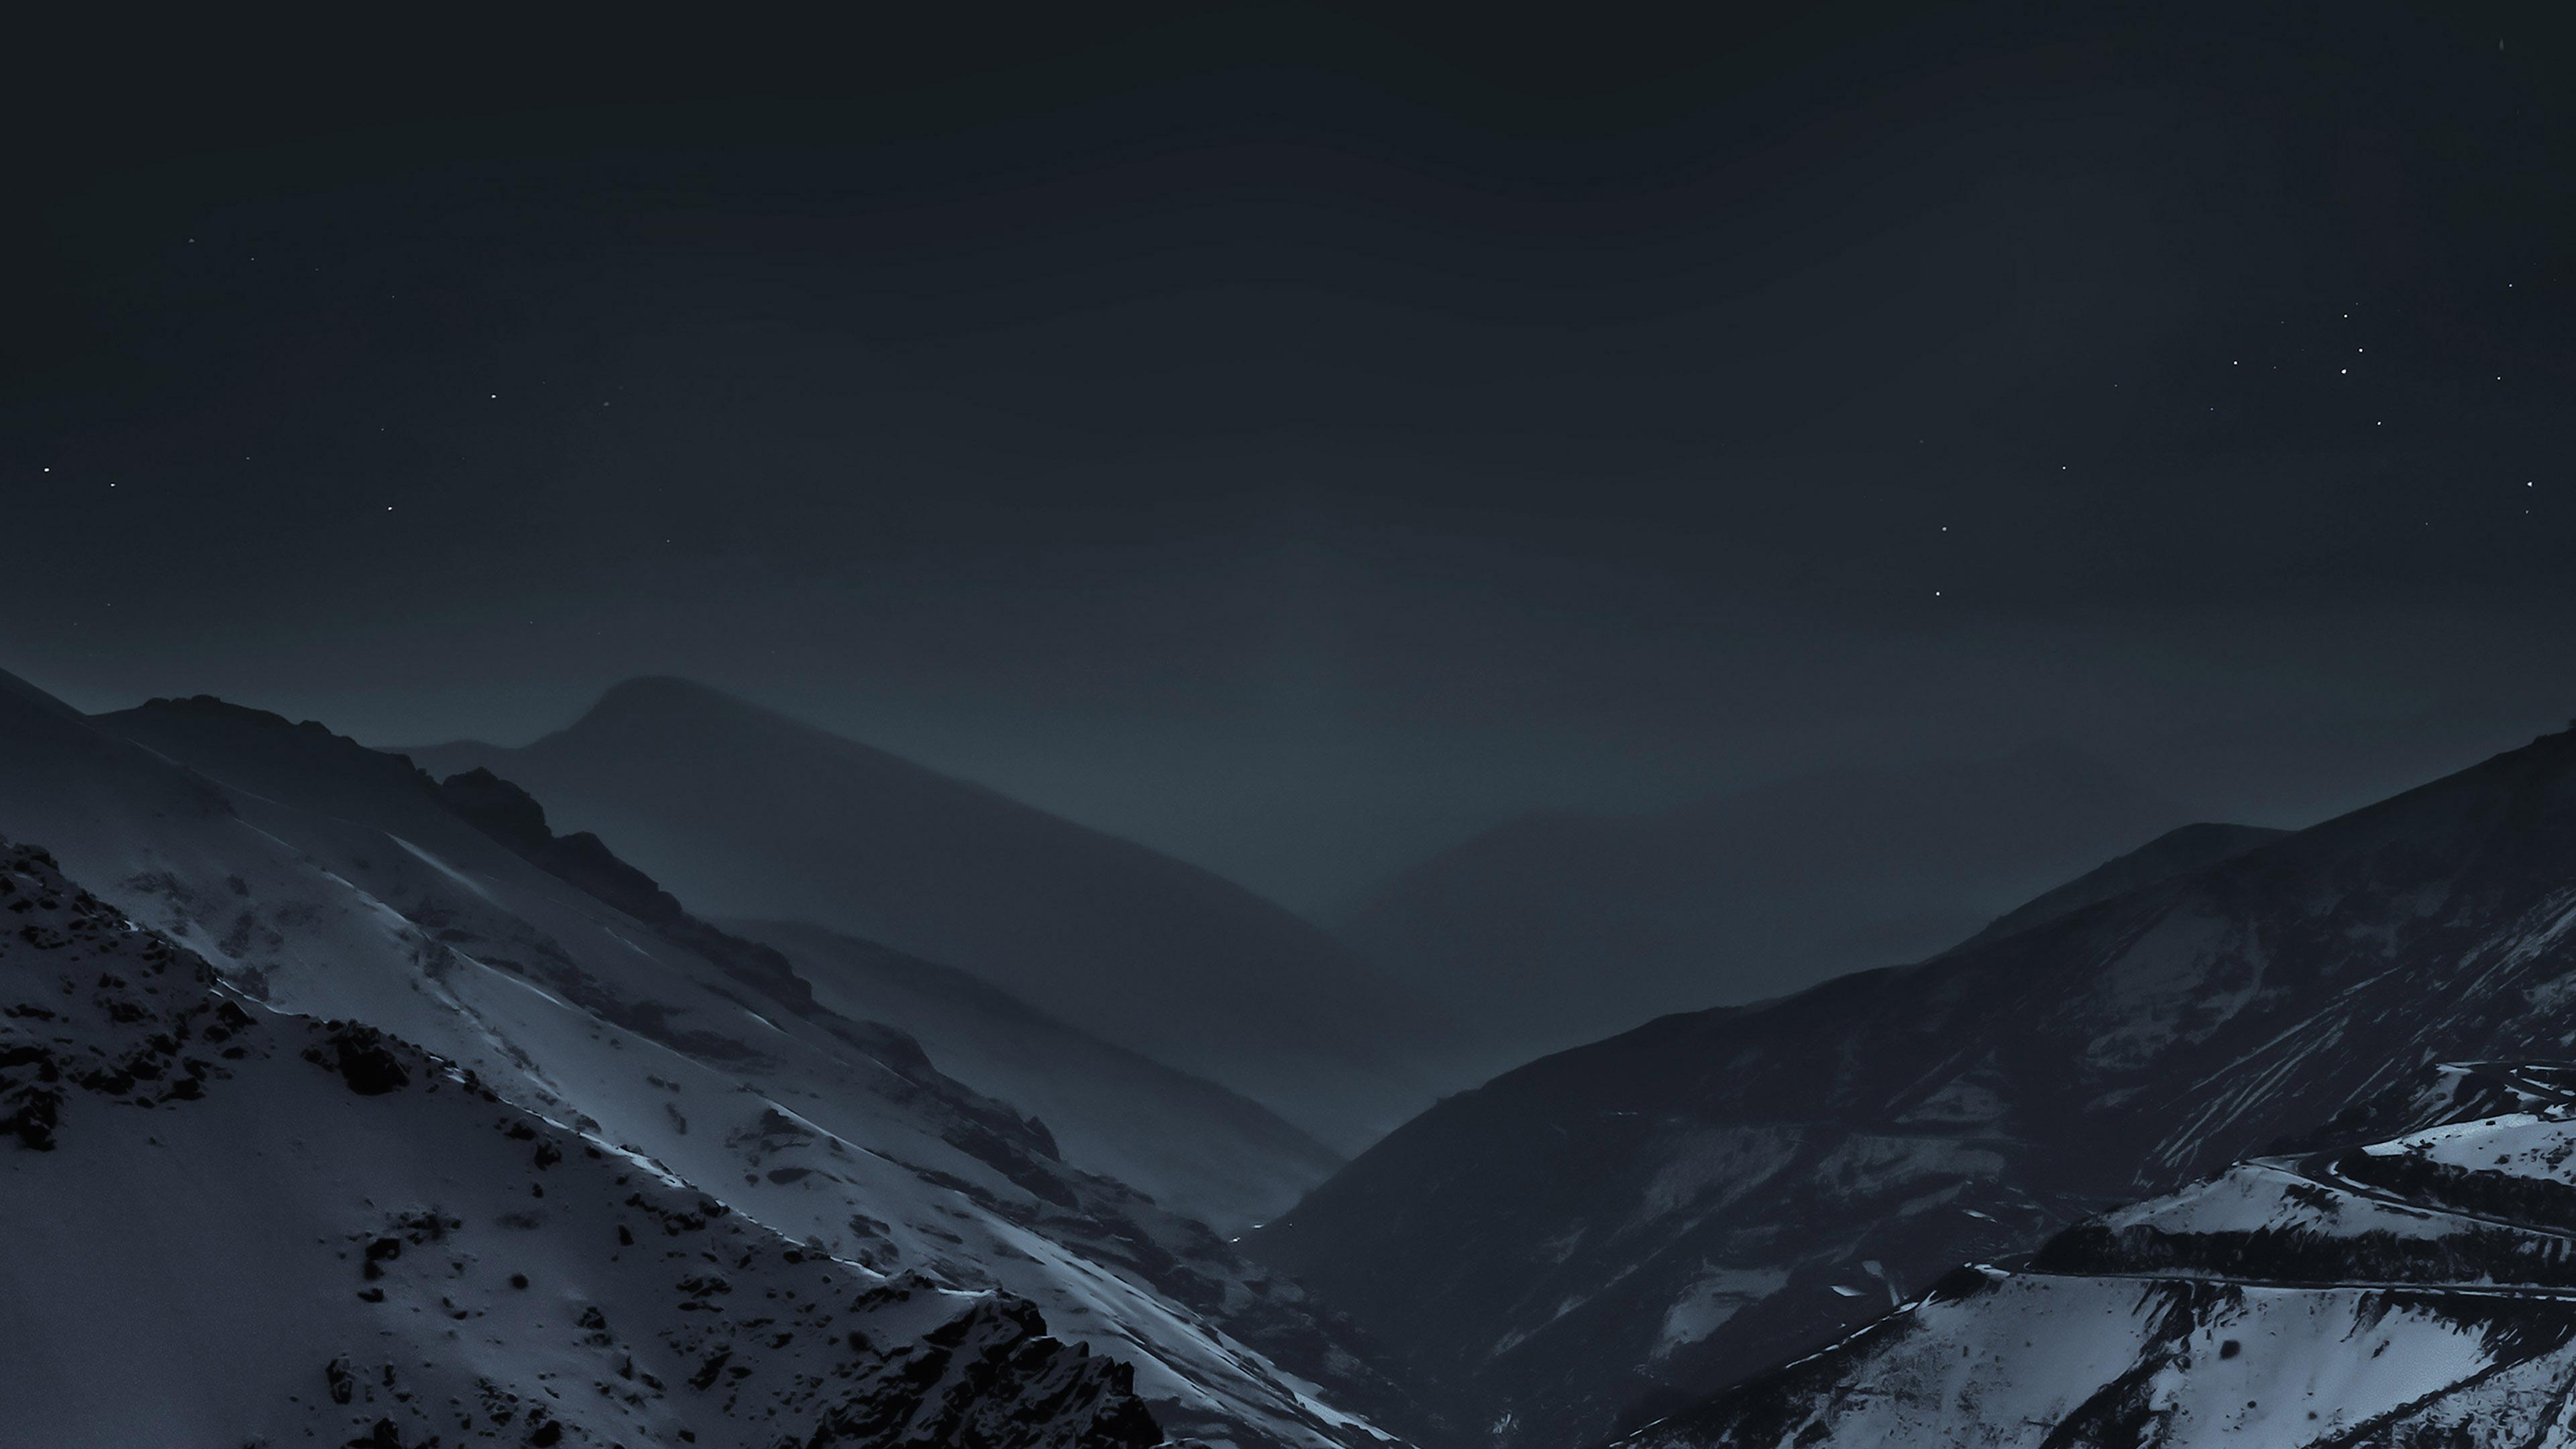 Fall Live Wallpaper Md49 Wallpaper Nature Earth Dark Asleep Mountain Night